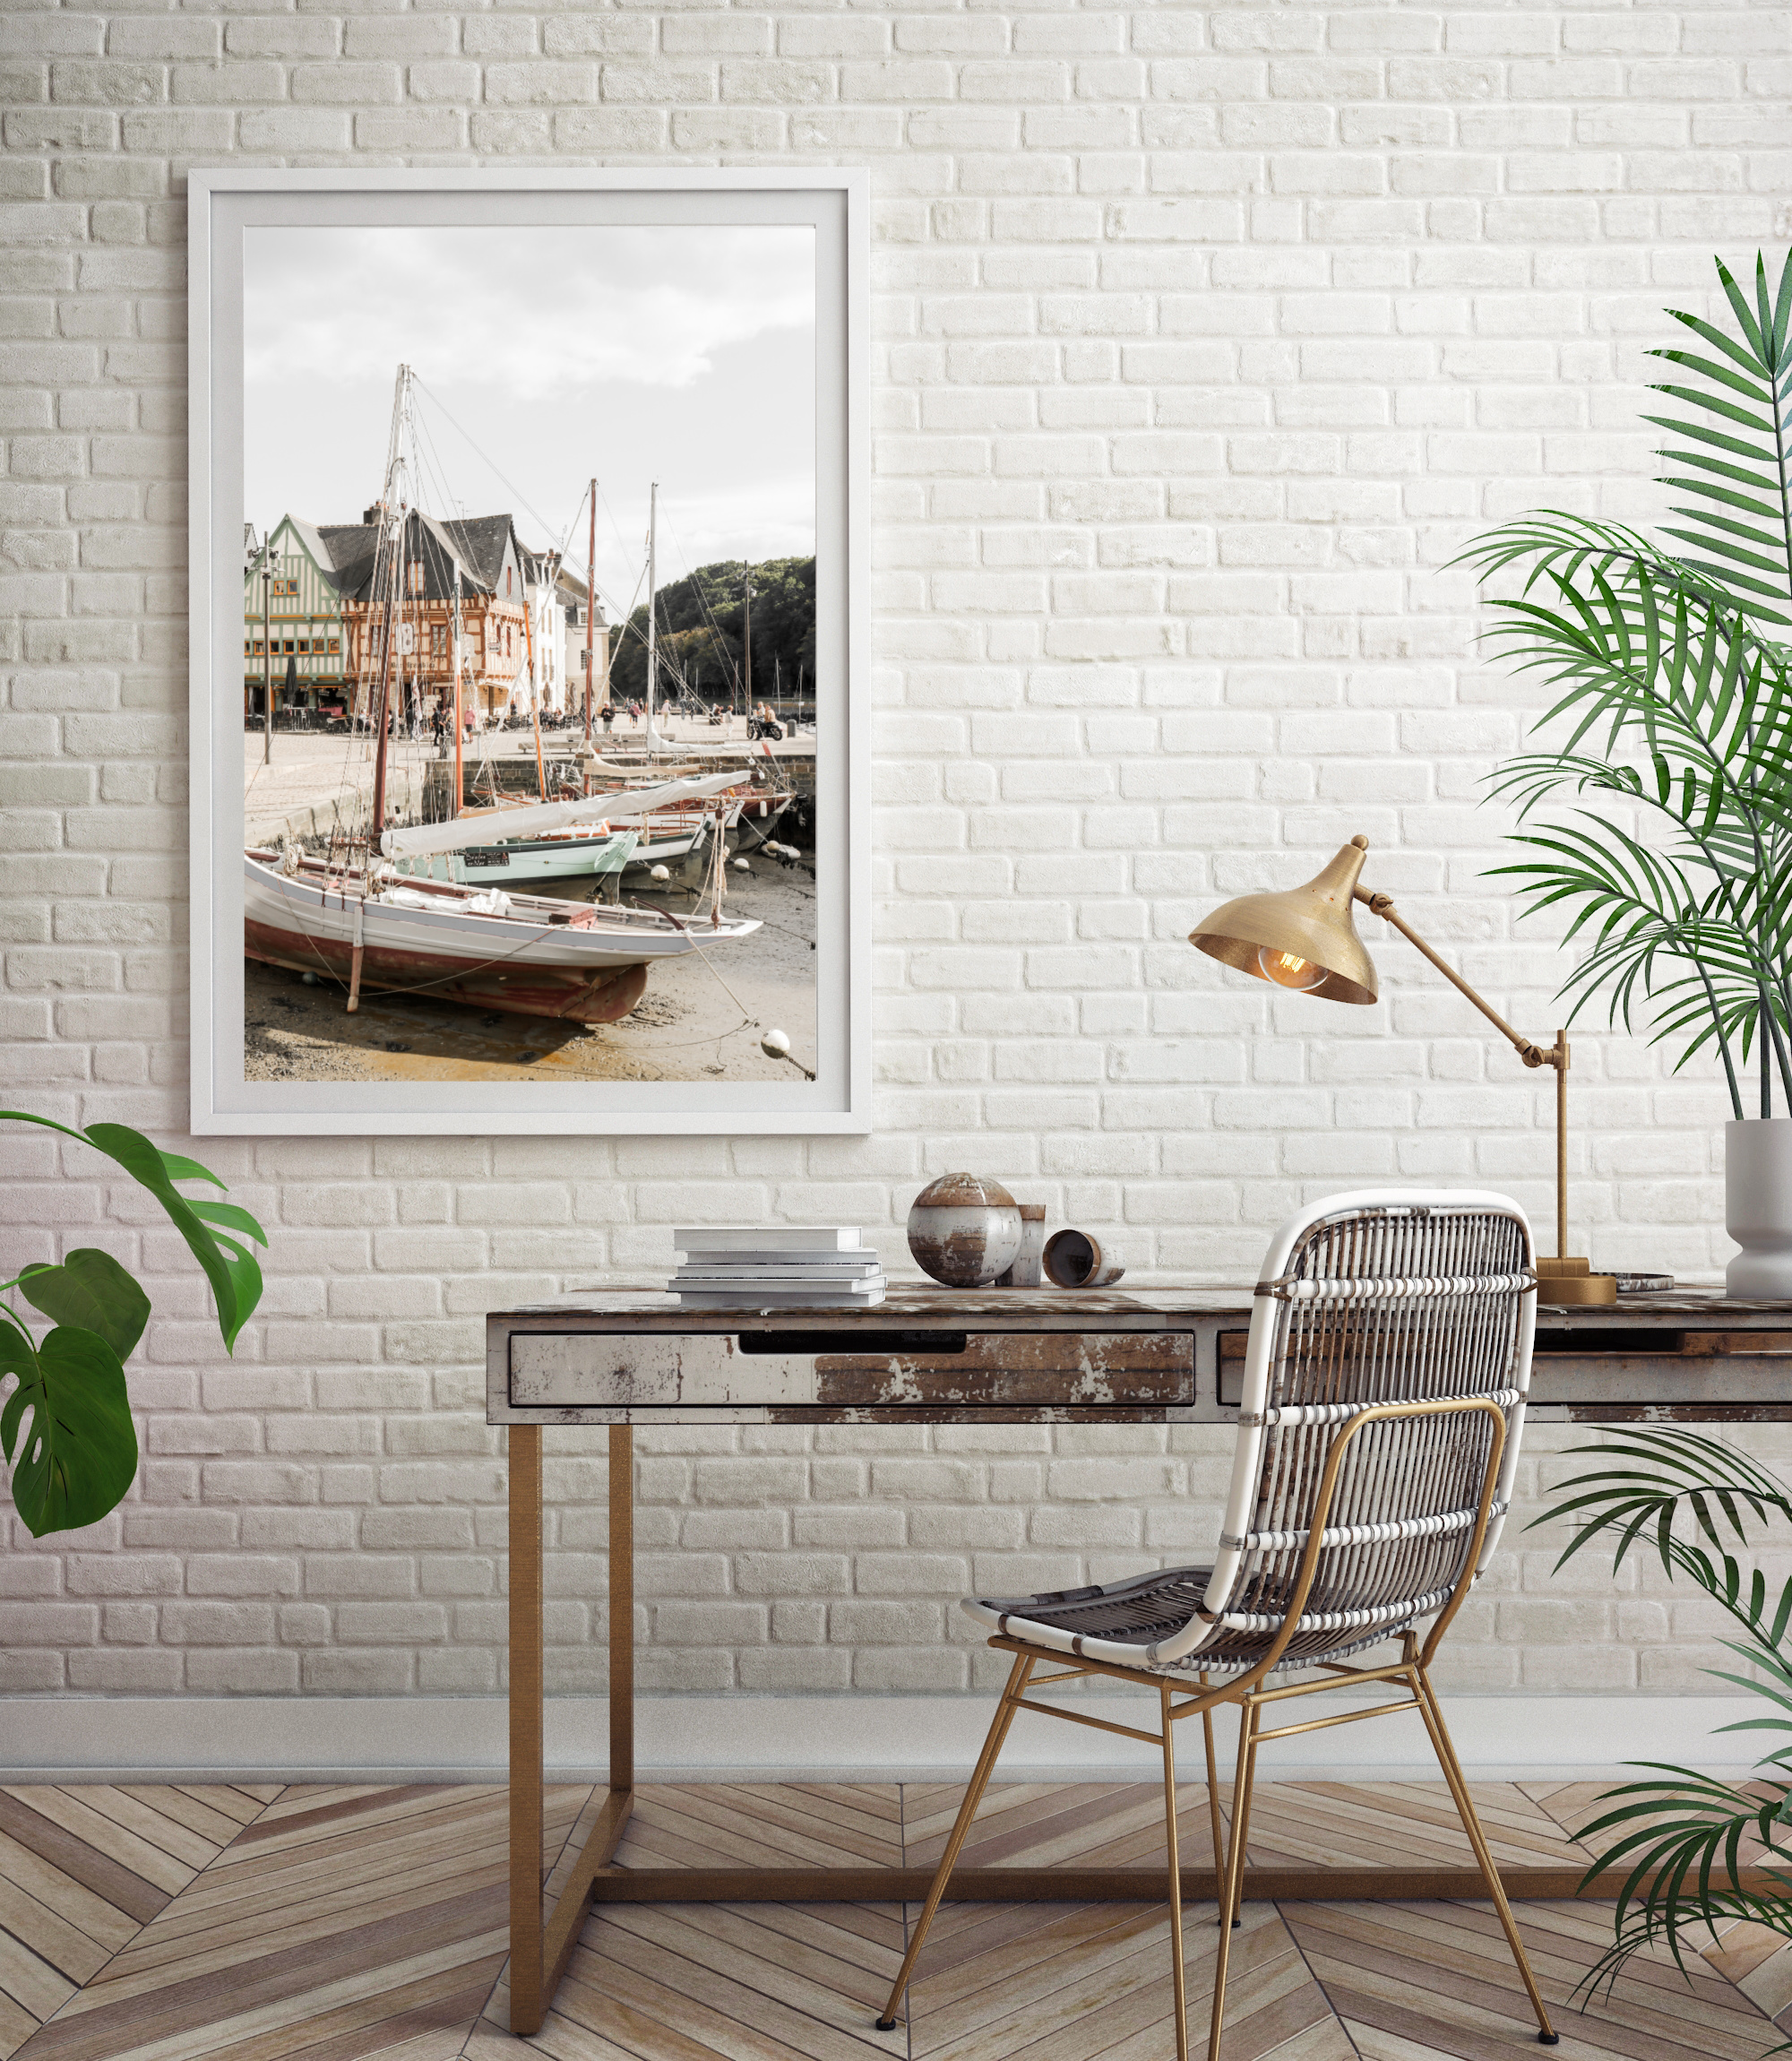 auray france wall print